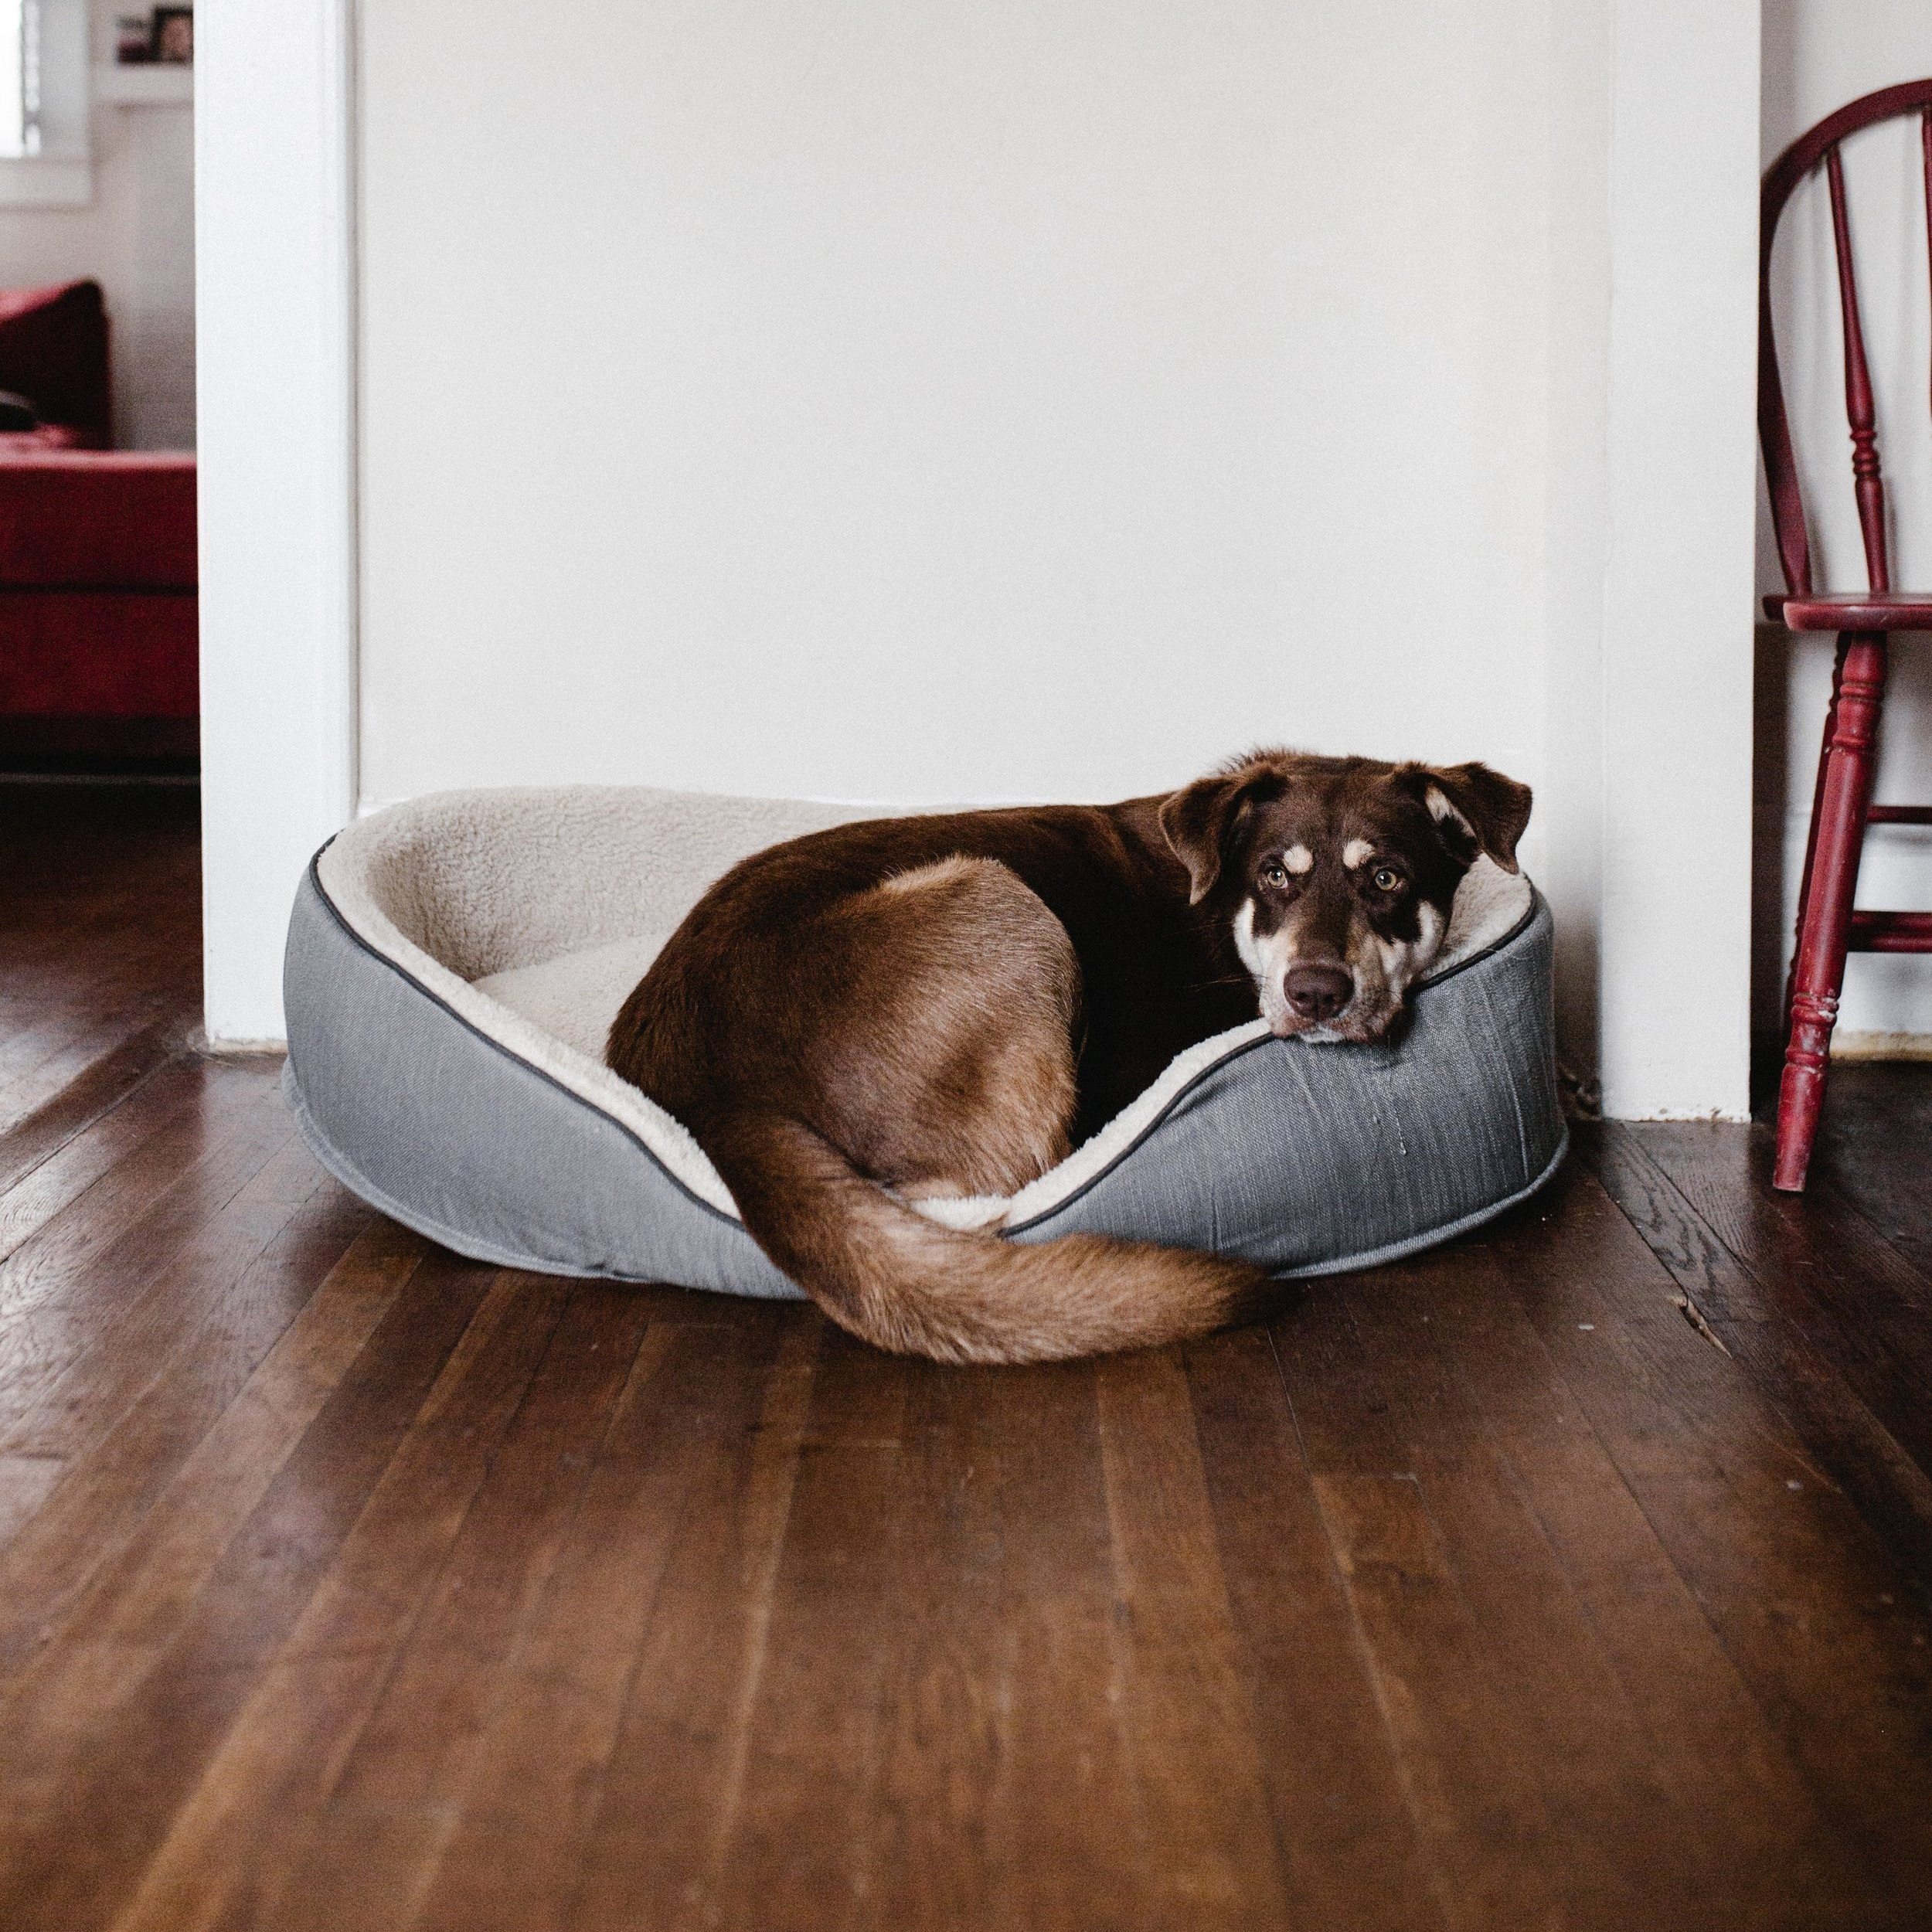 adorable-animal-bed-2248516.jpg